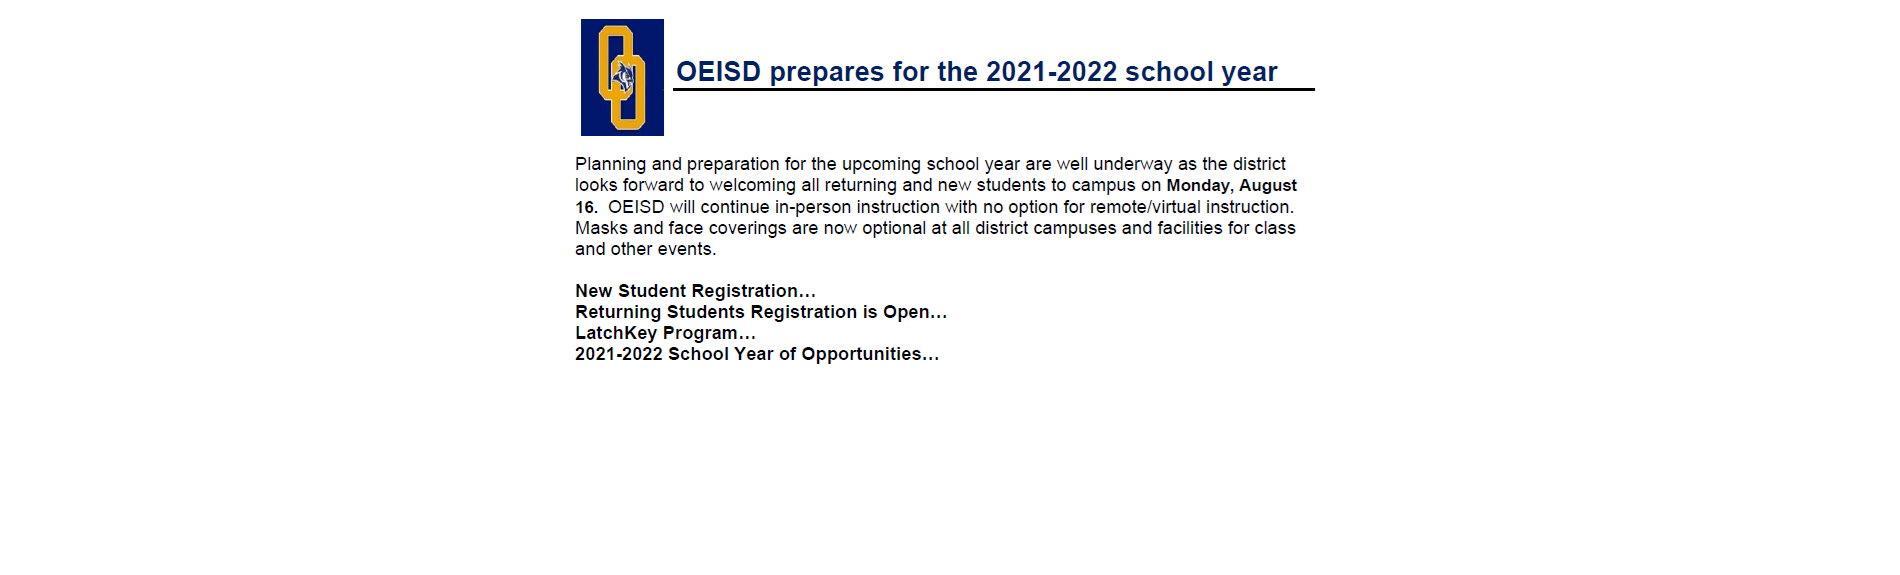 OE-ISD Prepares for 2021